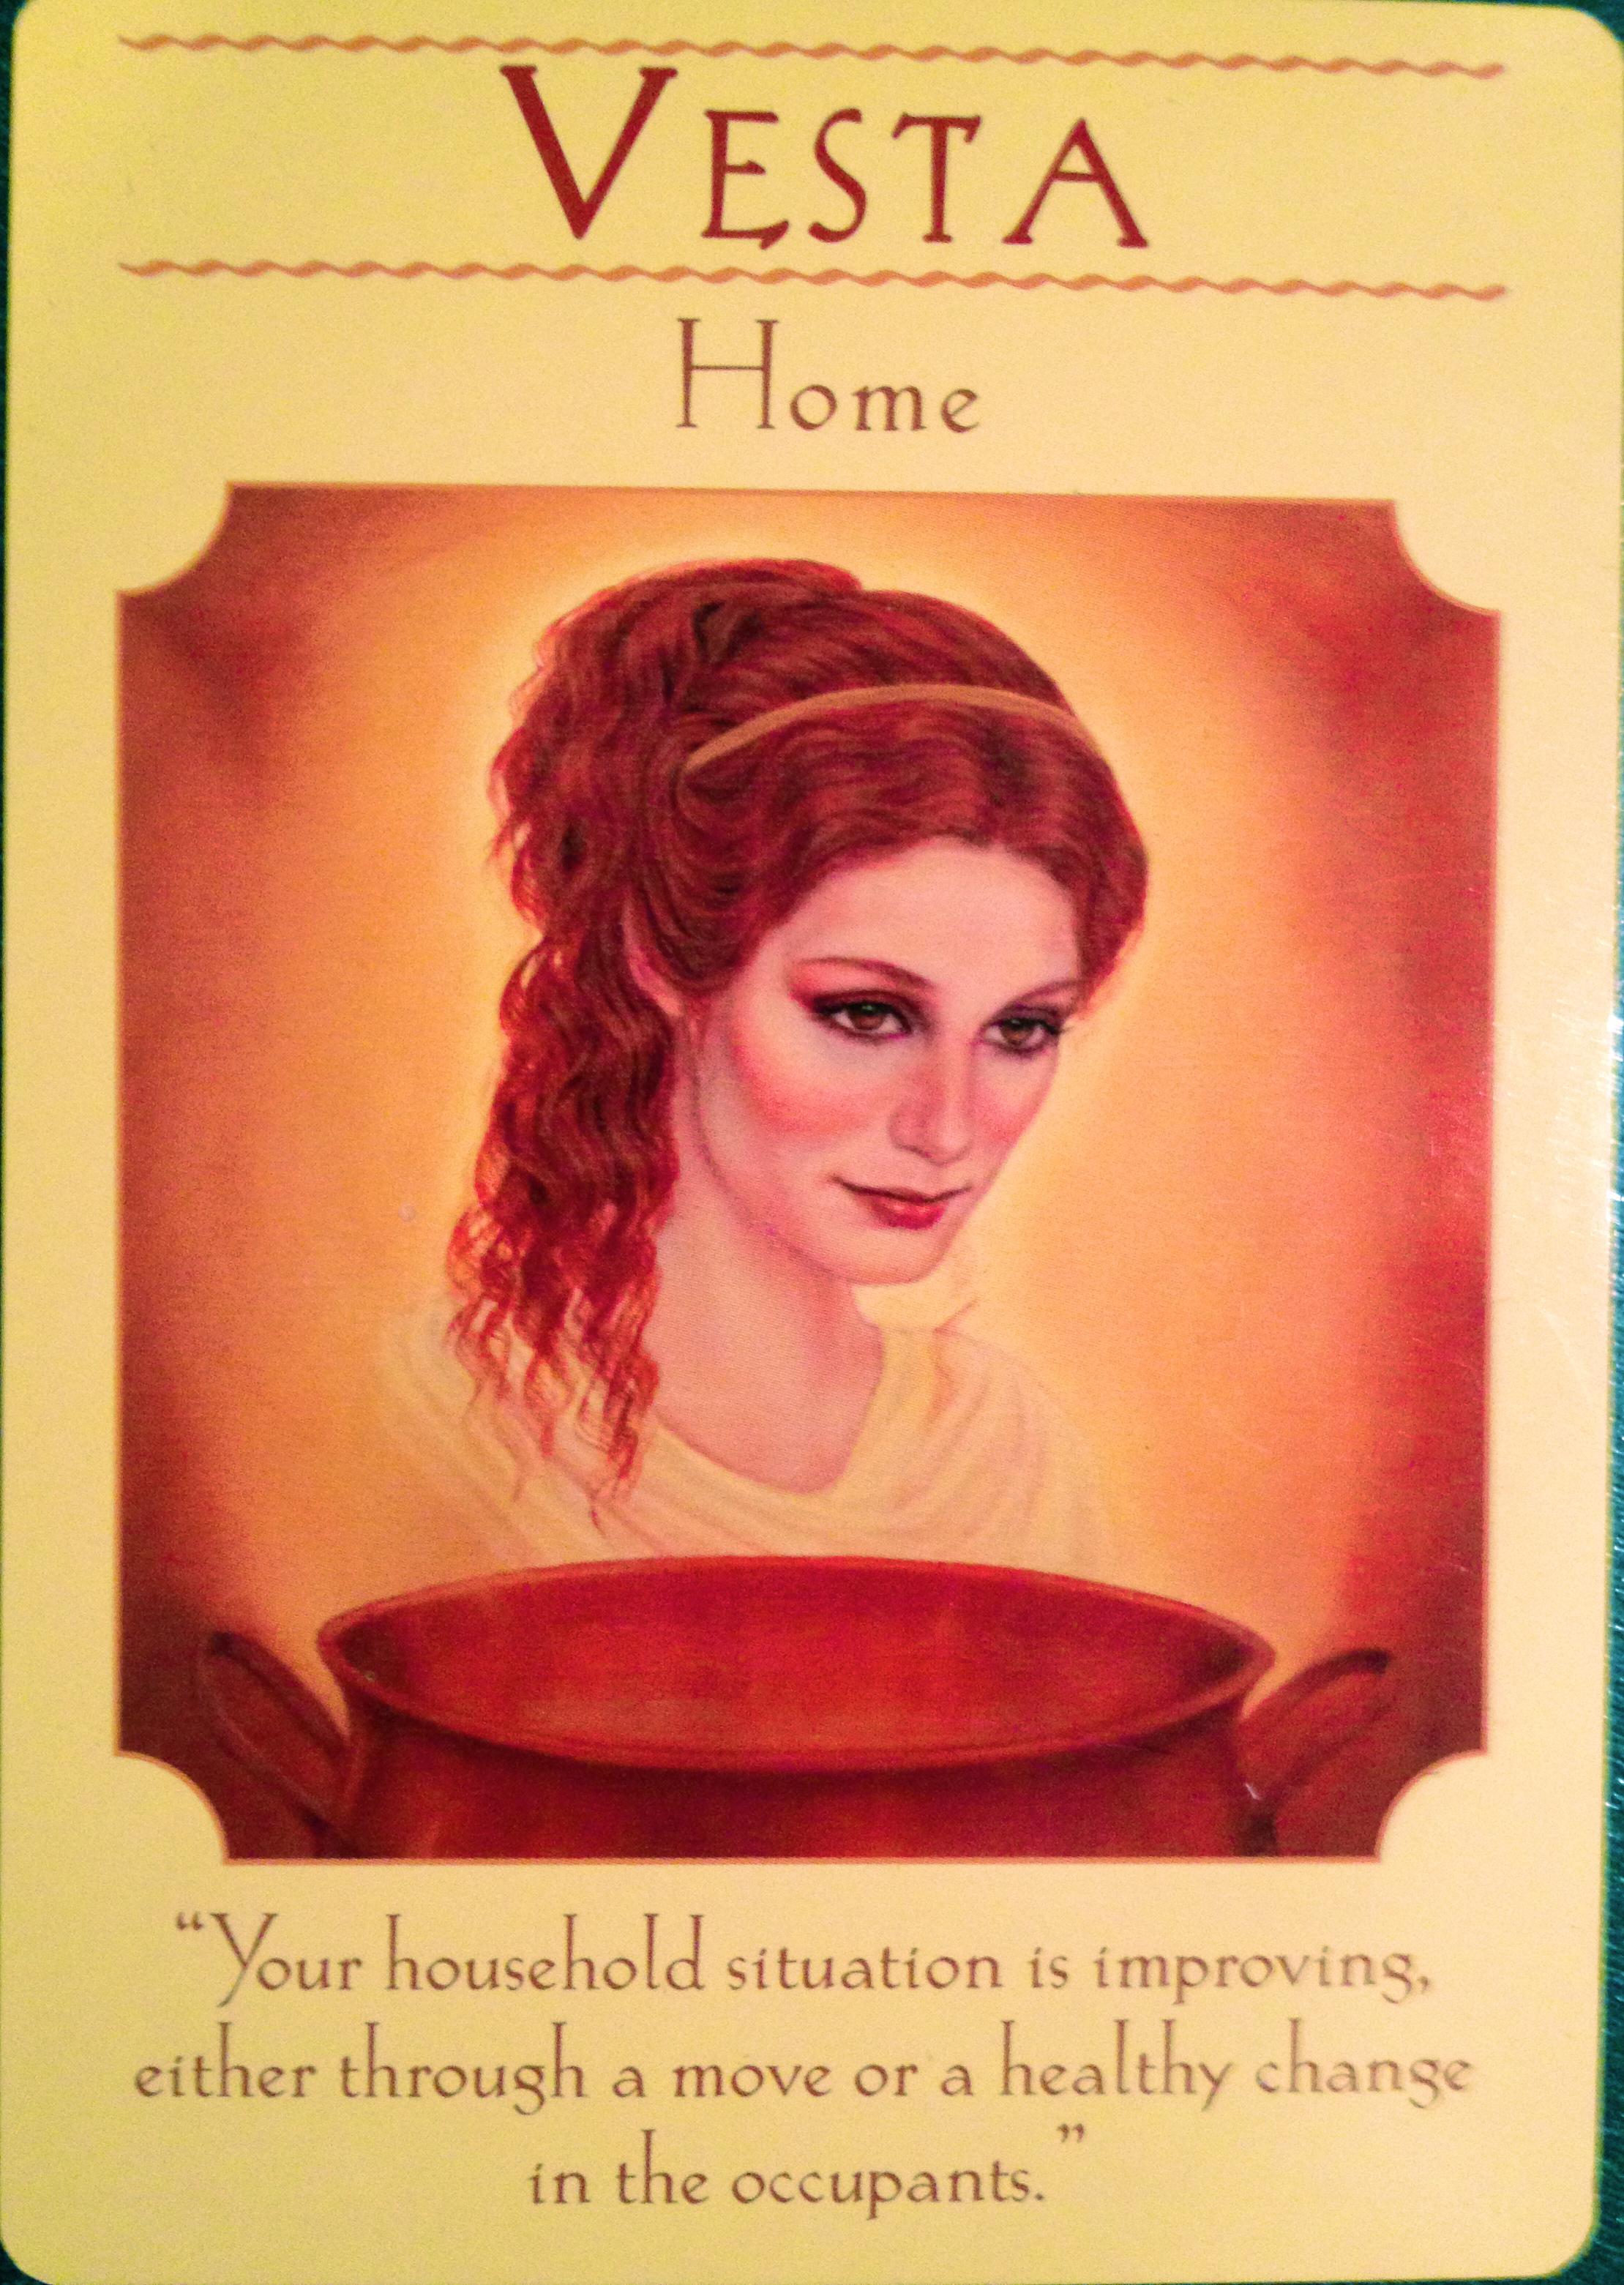 Goddess Vesta Home Archangel Oracle Divine Guidance